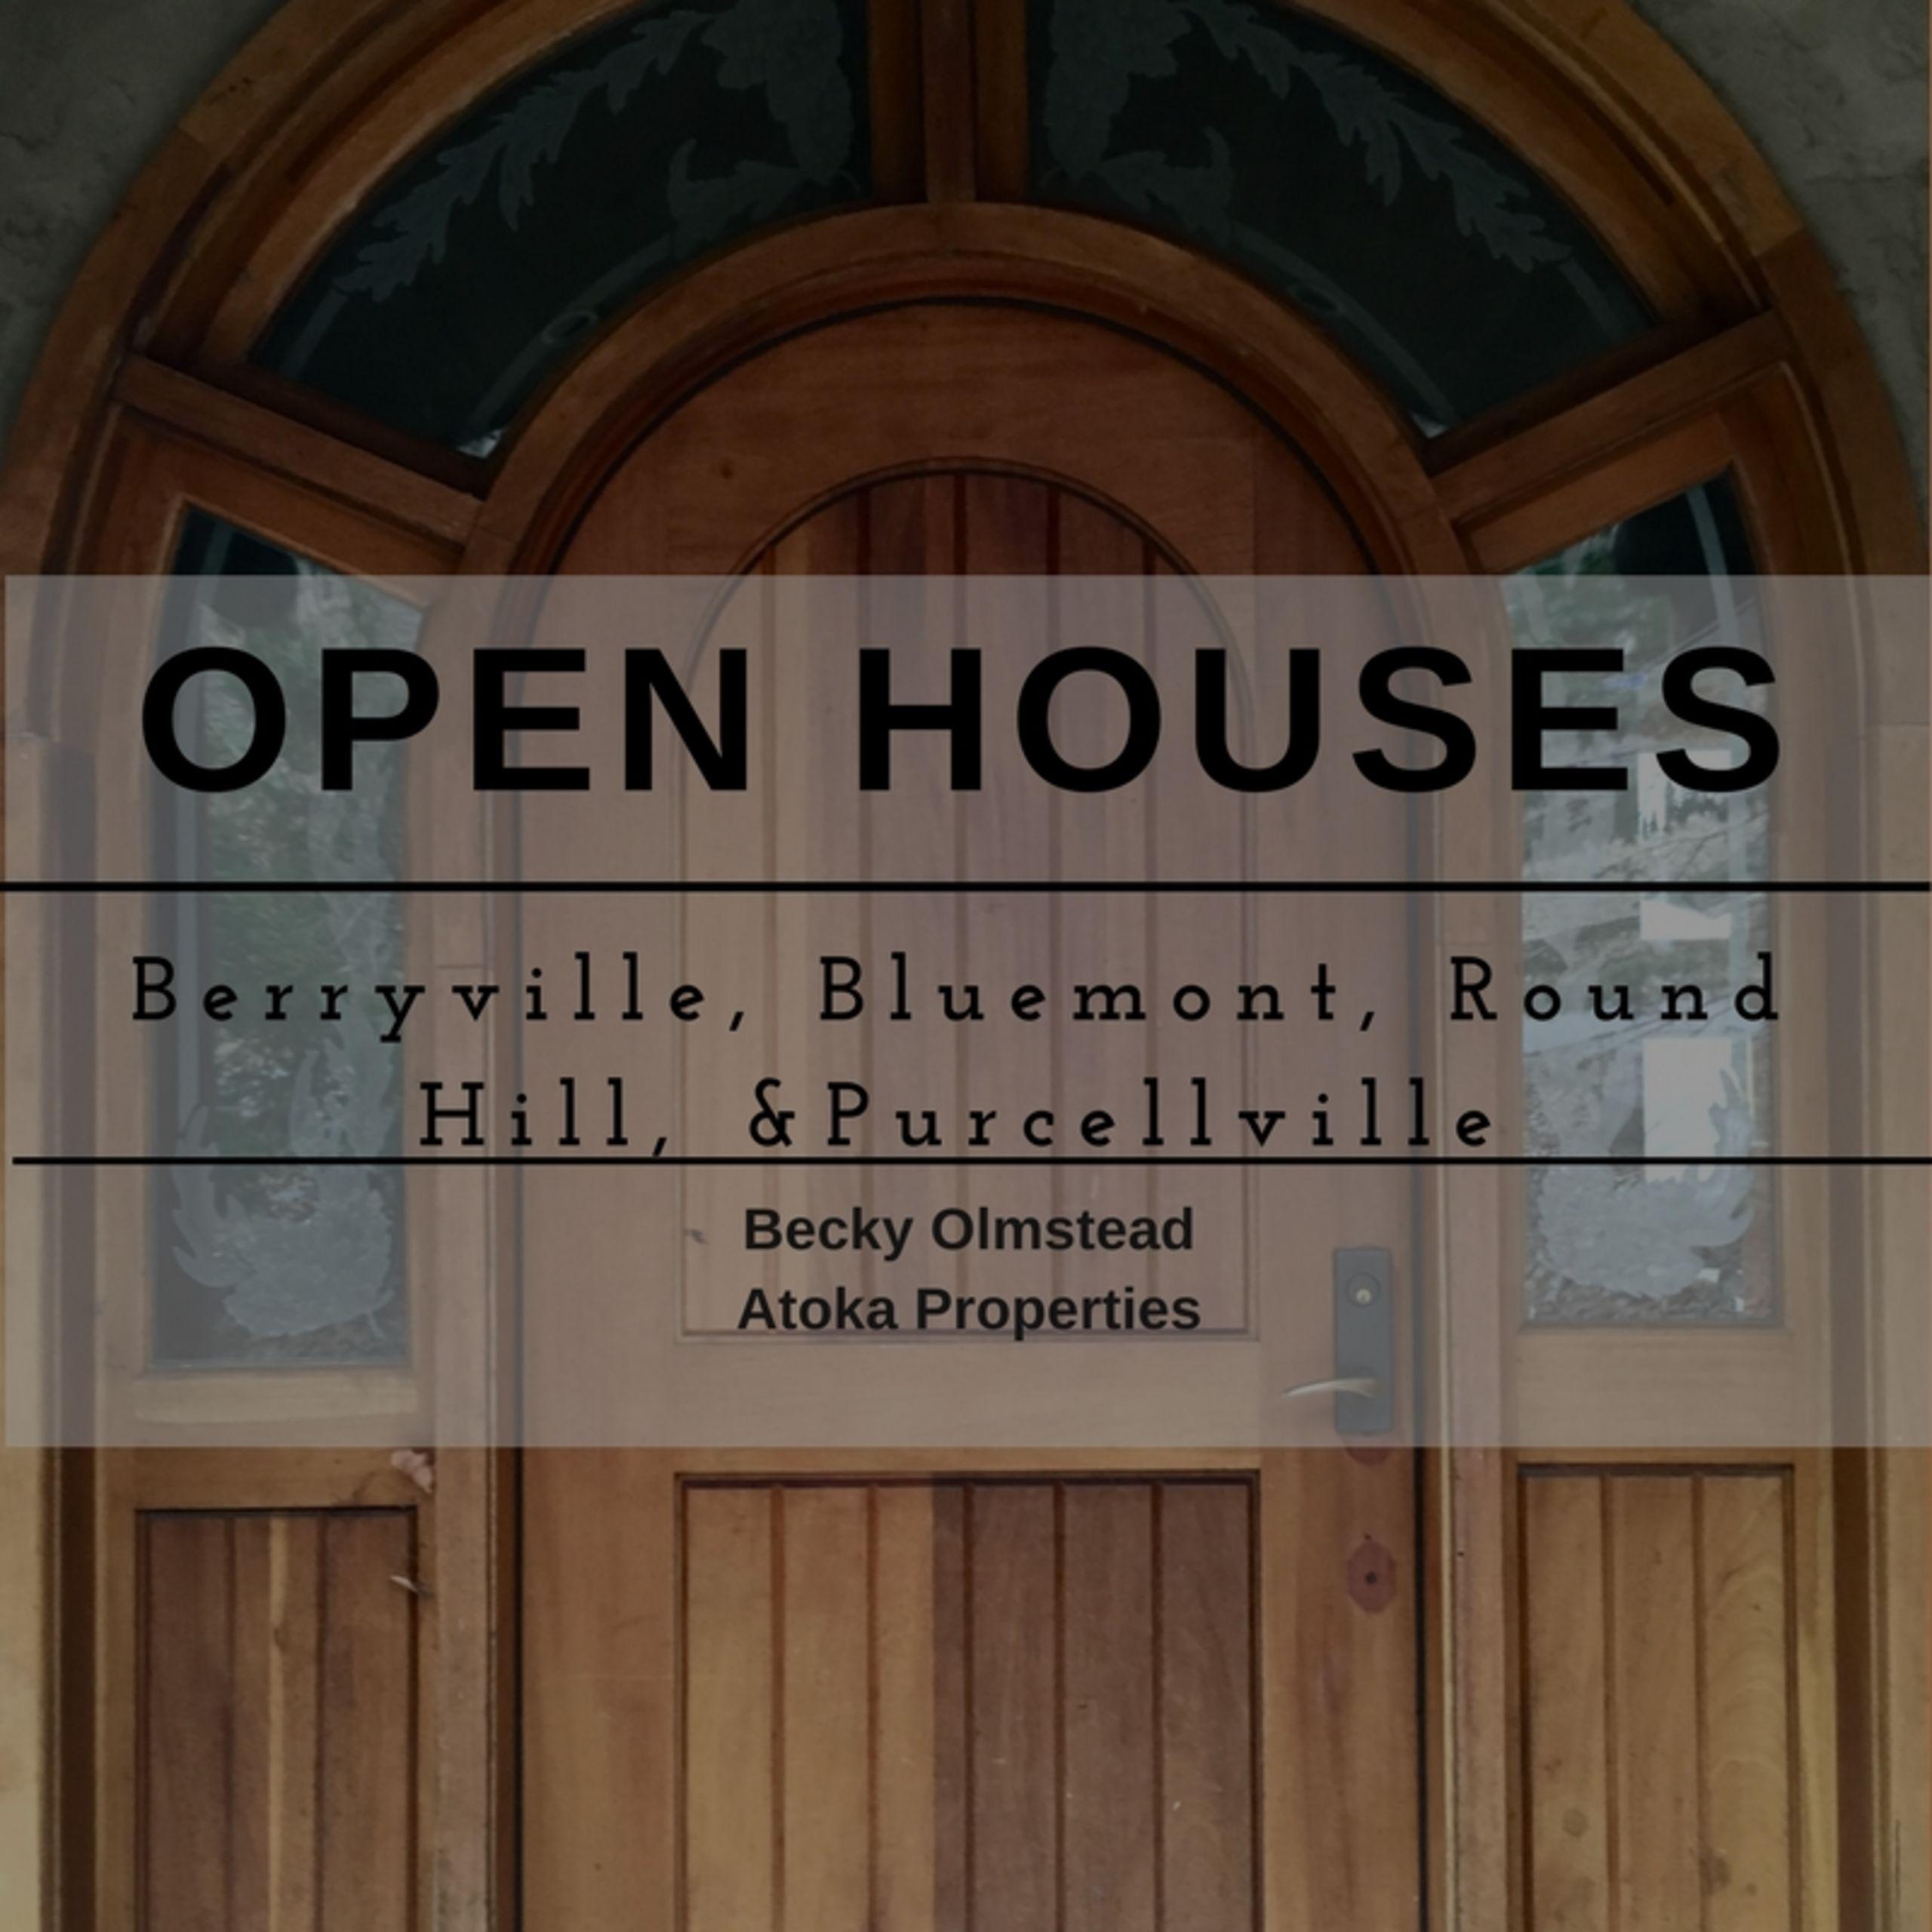 OPEN HOUSE LIST 12/9/17 – 12/10/17